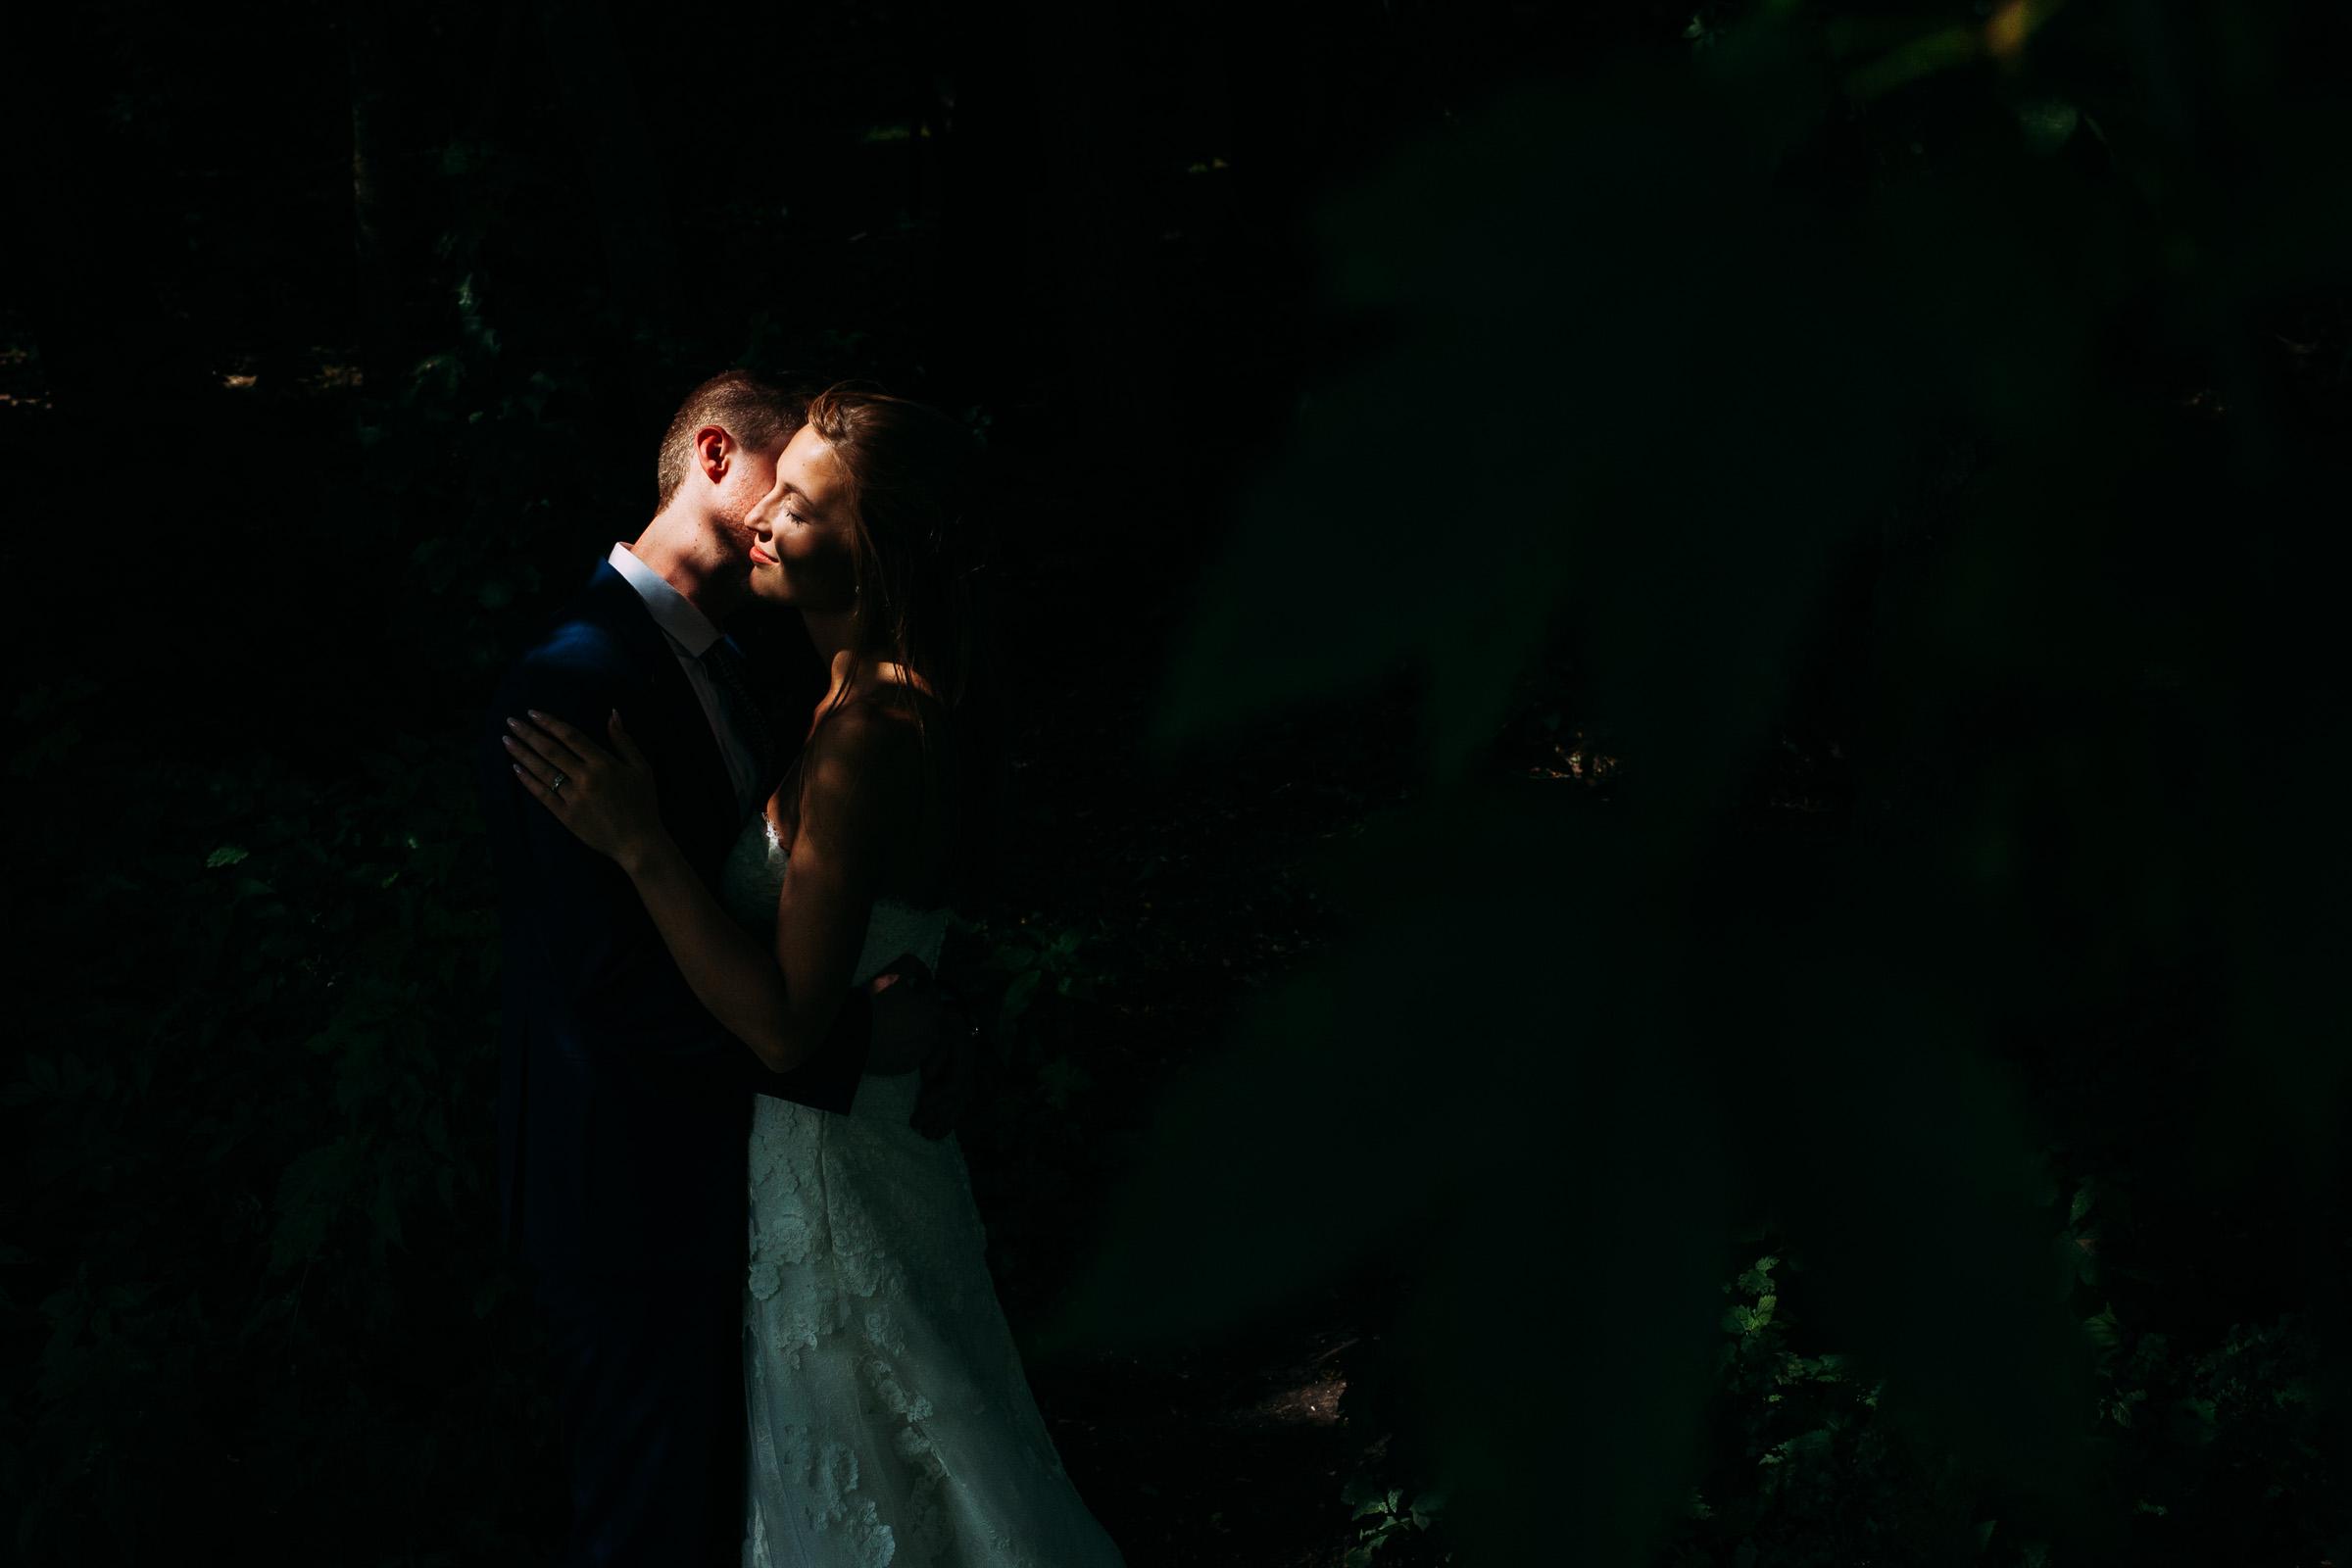 Huwelijksfotograaf_l'Auberge du pêcheur